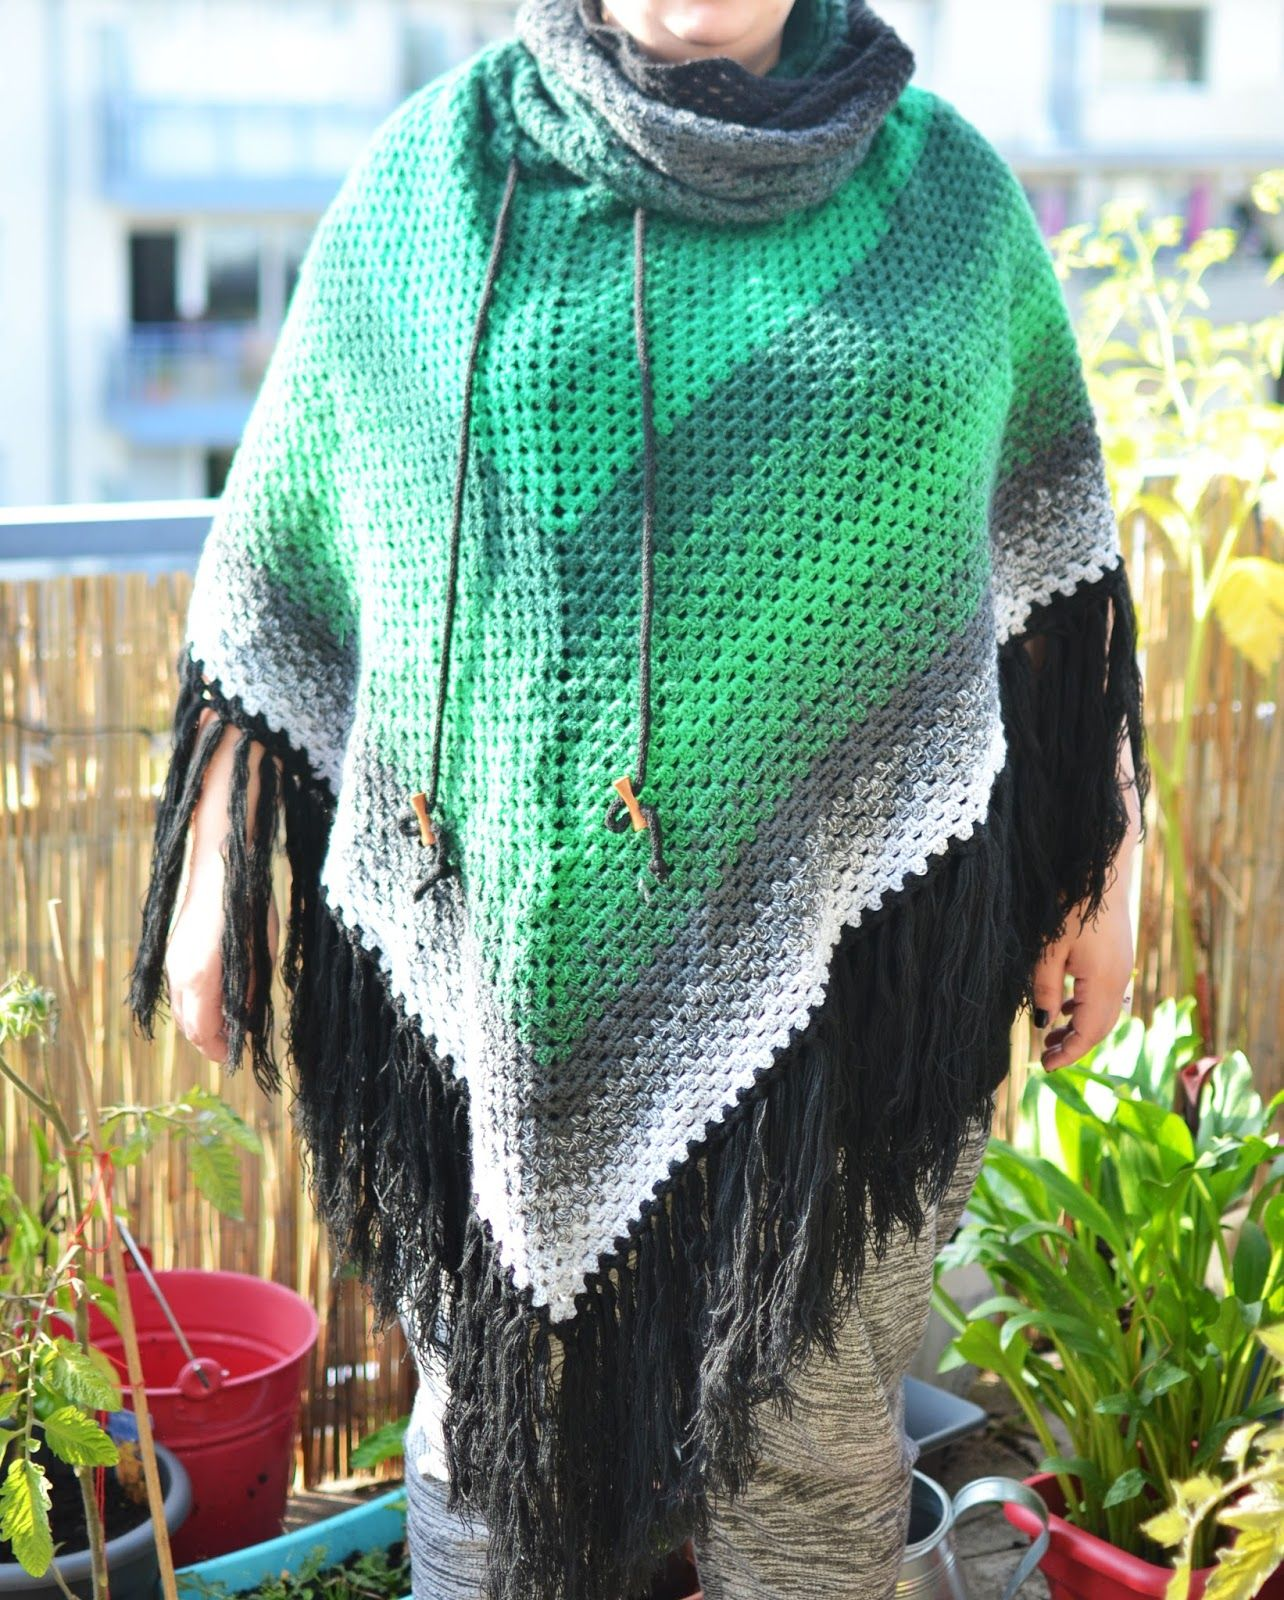 Julekind Anleitung Granny Poncho Mit Kapuzenschal Häkeln Crochet